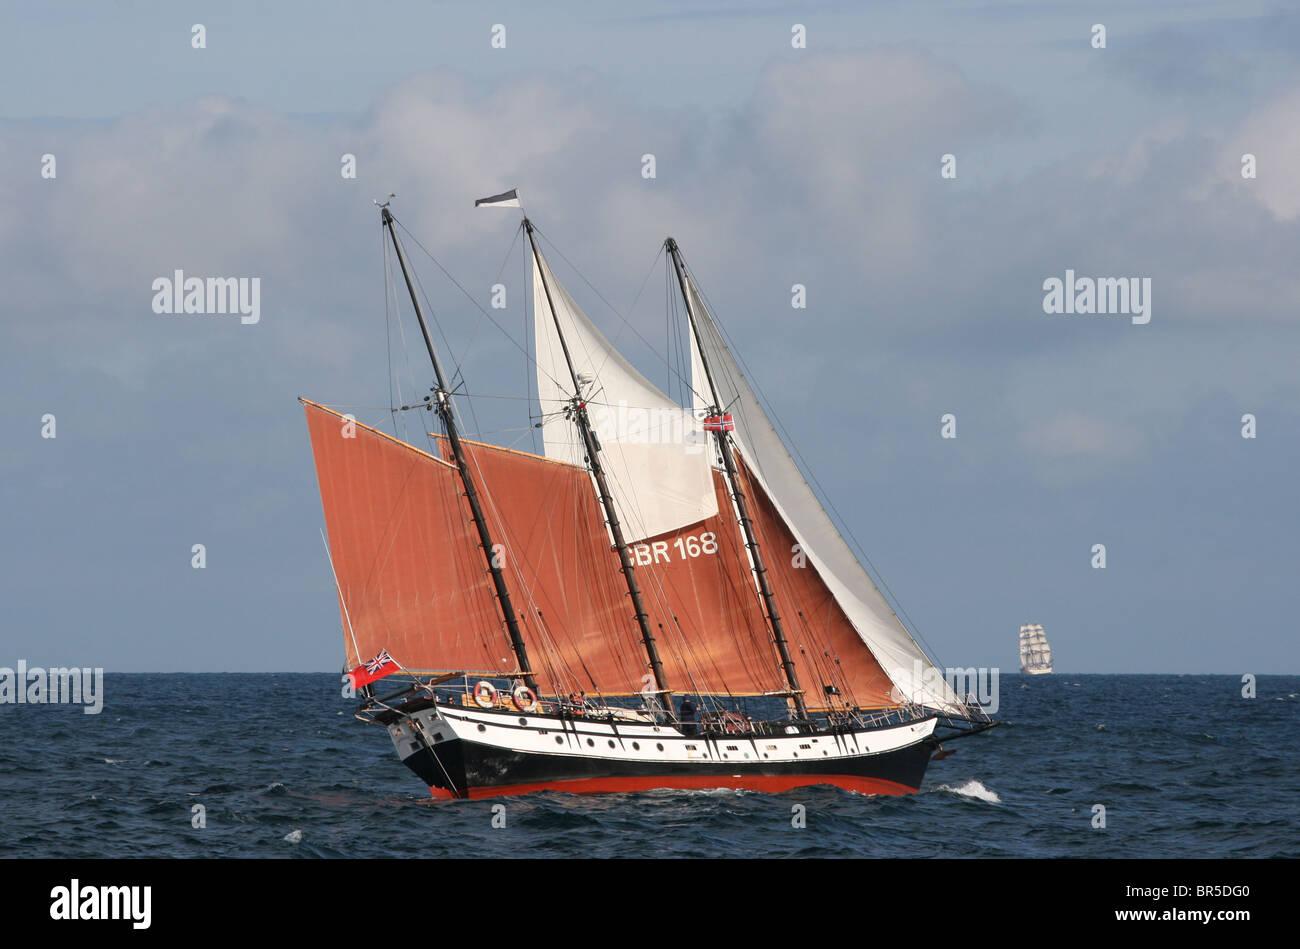 Trinovante, The Tall Ships Races 2010, Kristiansand - Stock Image